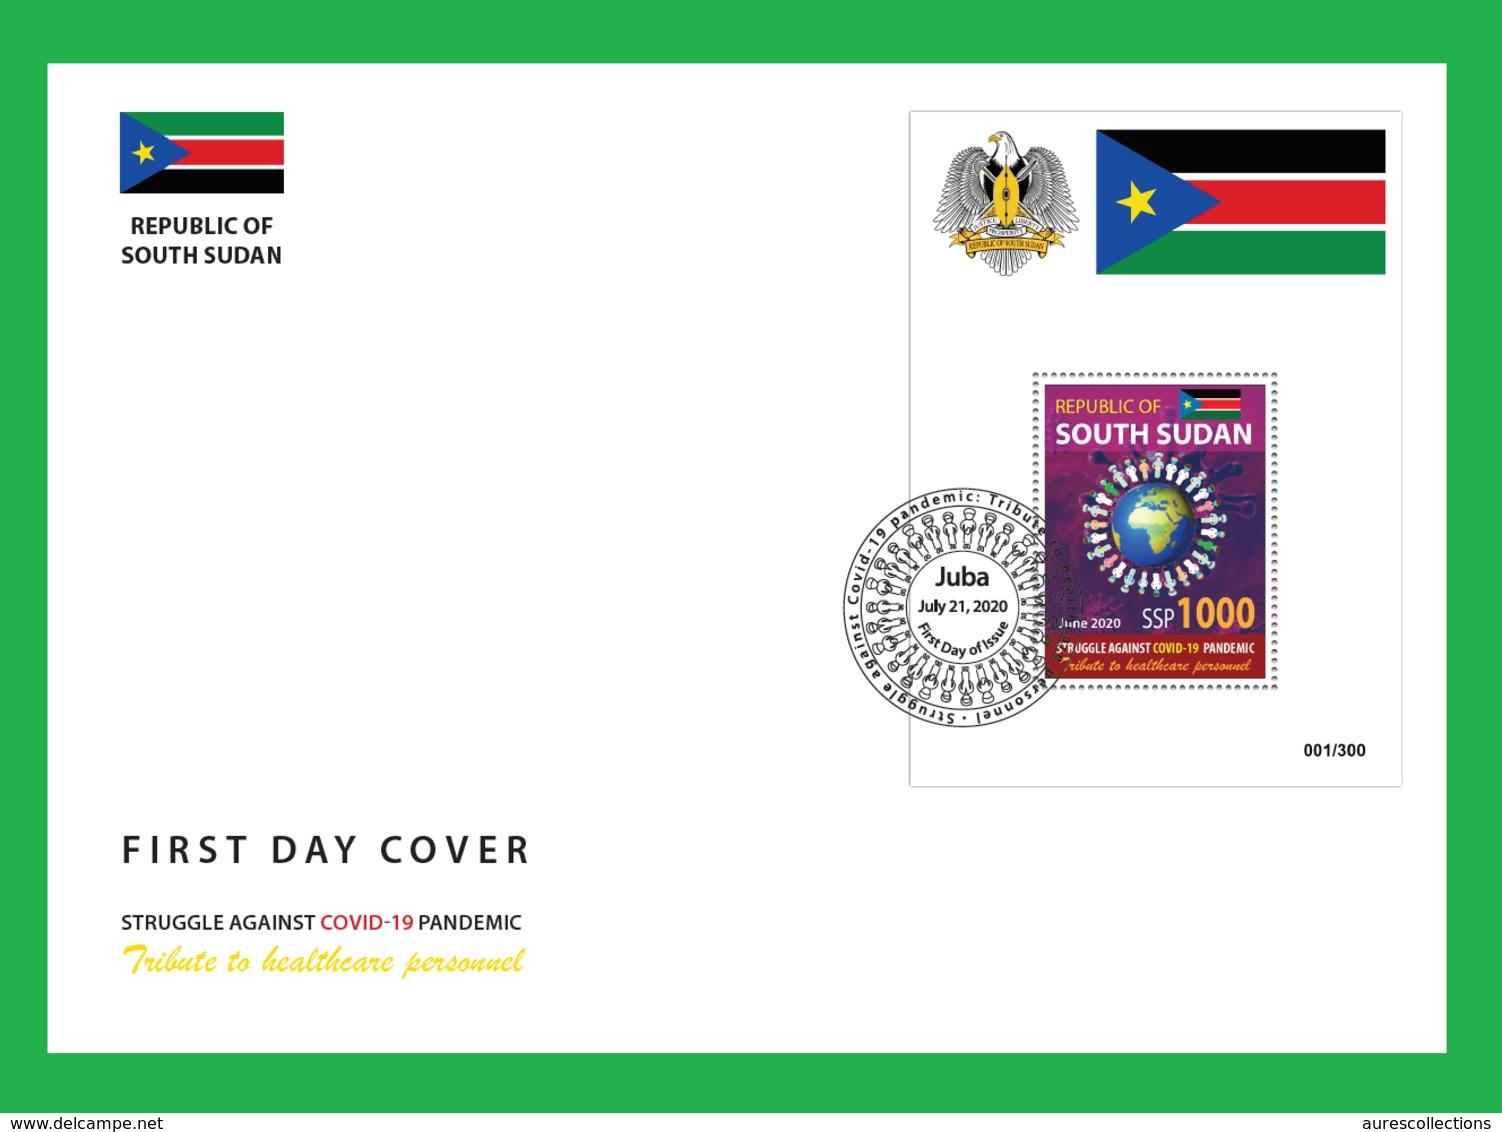 SOUTH SUDAN 2020 - FDC - SOUVENIR SHEET FDC - COVID-19 PANDEMIC PANDEMIE CORONA CORONAVIRUS - RARE - Gemeinschaftsausgaben